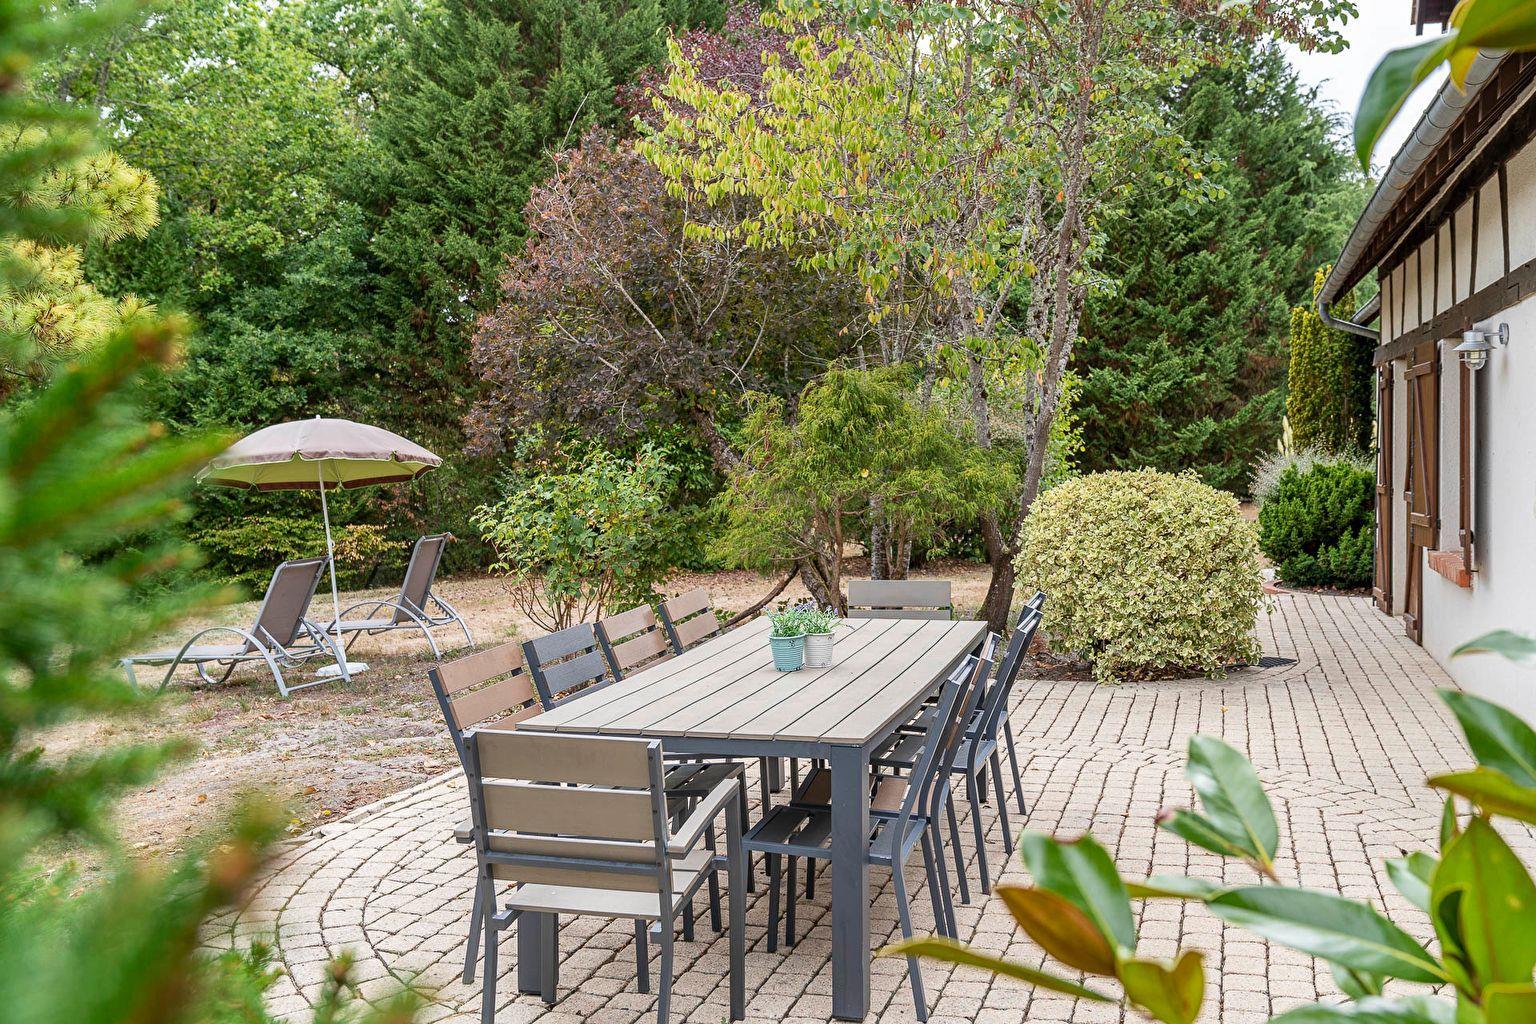 Location - Villa 5 Chambres - 2 Salles De Bain - Climatisation **** - Camping Sandaya Les Alicourts Resort